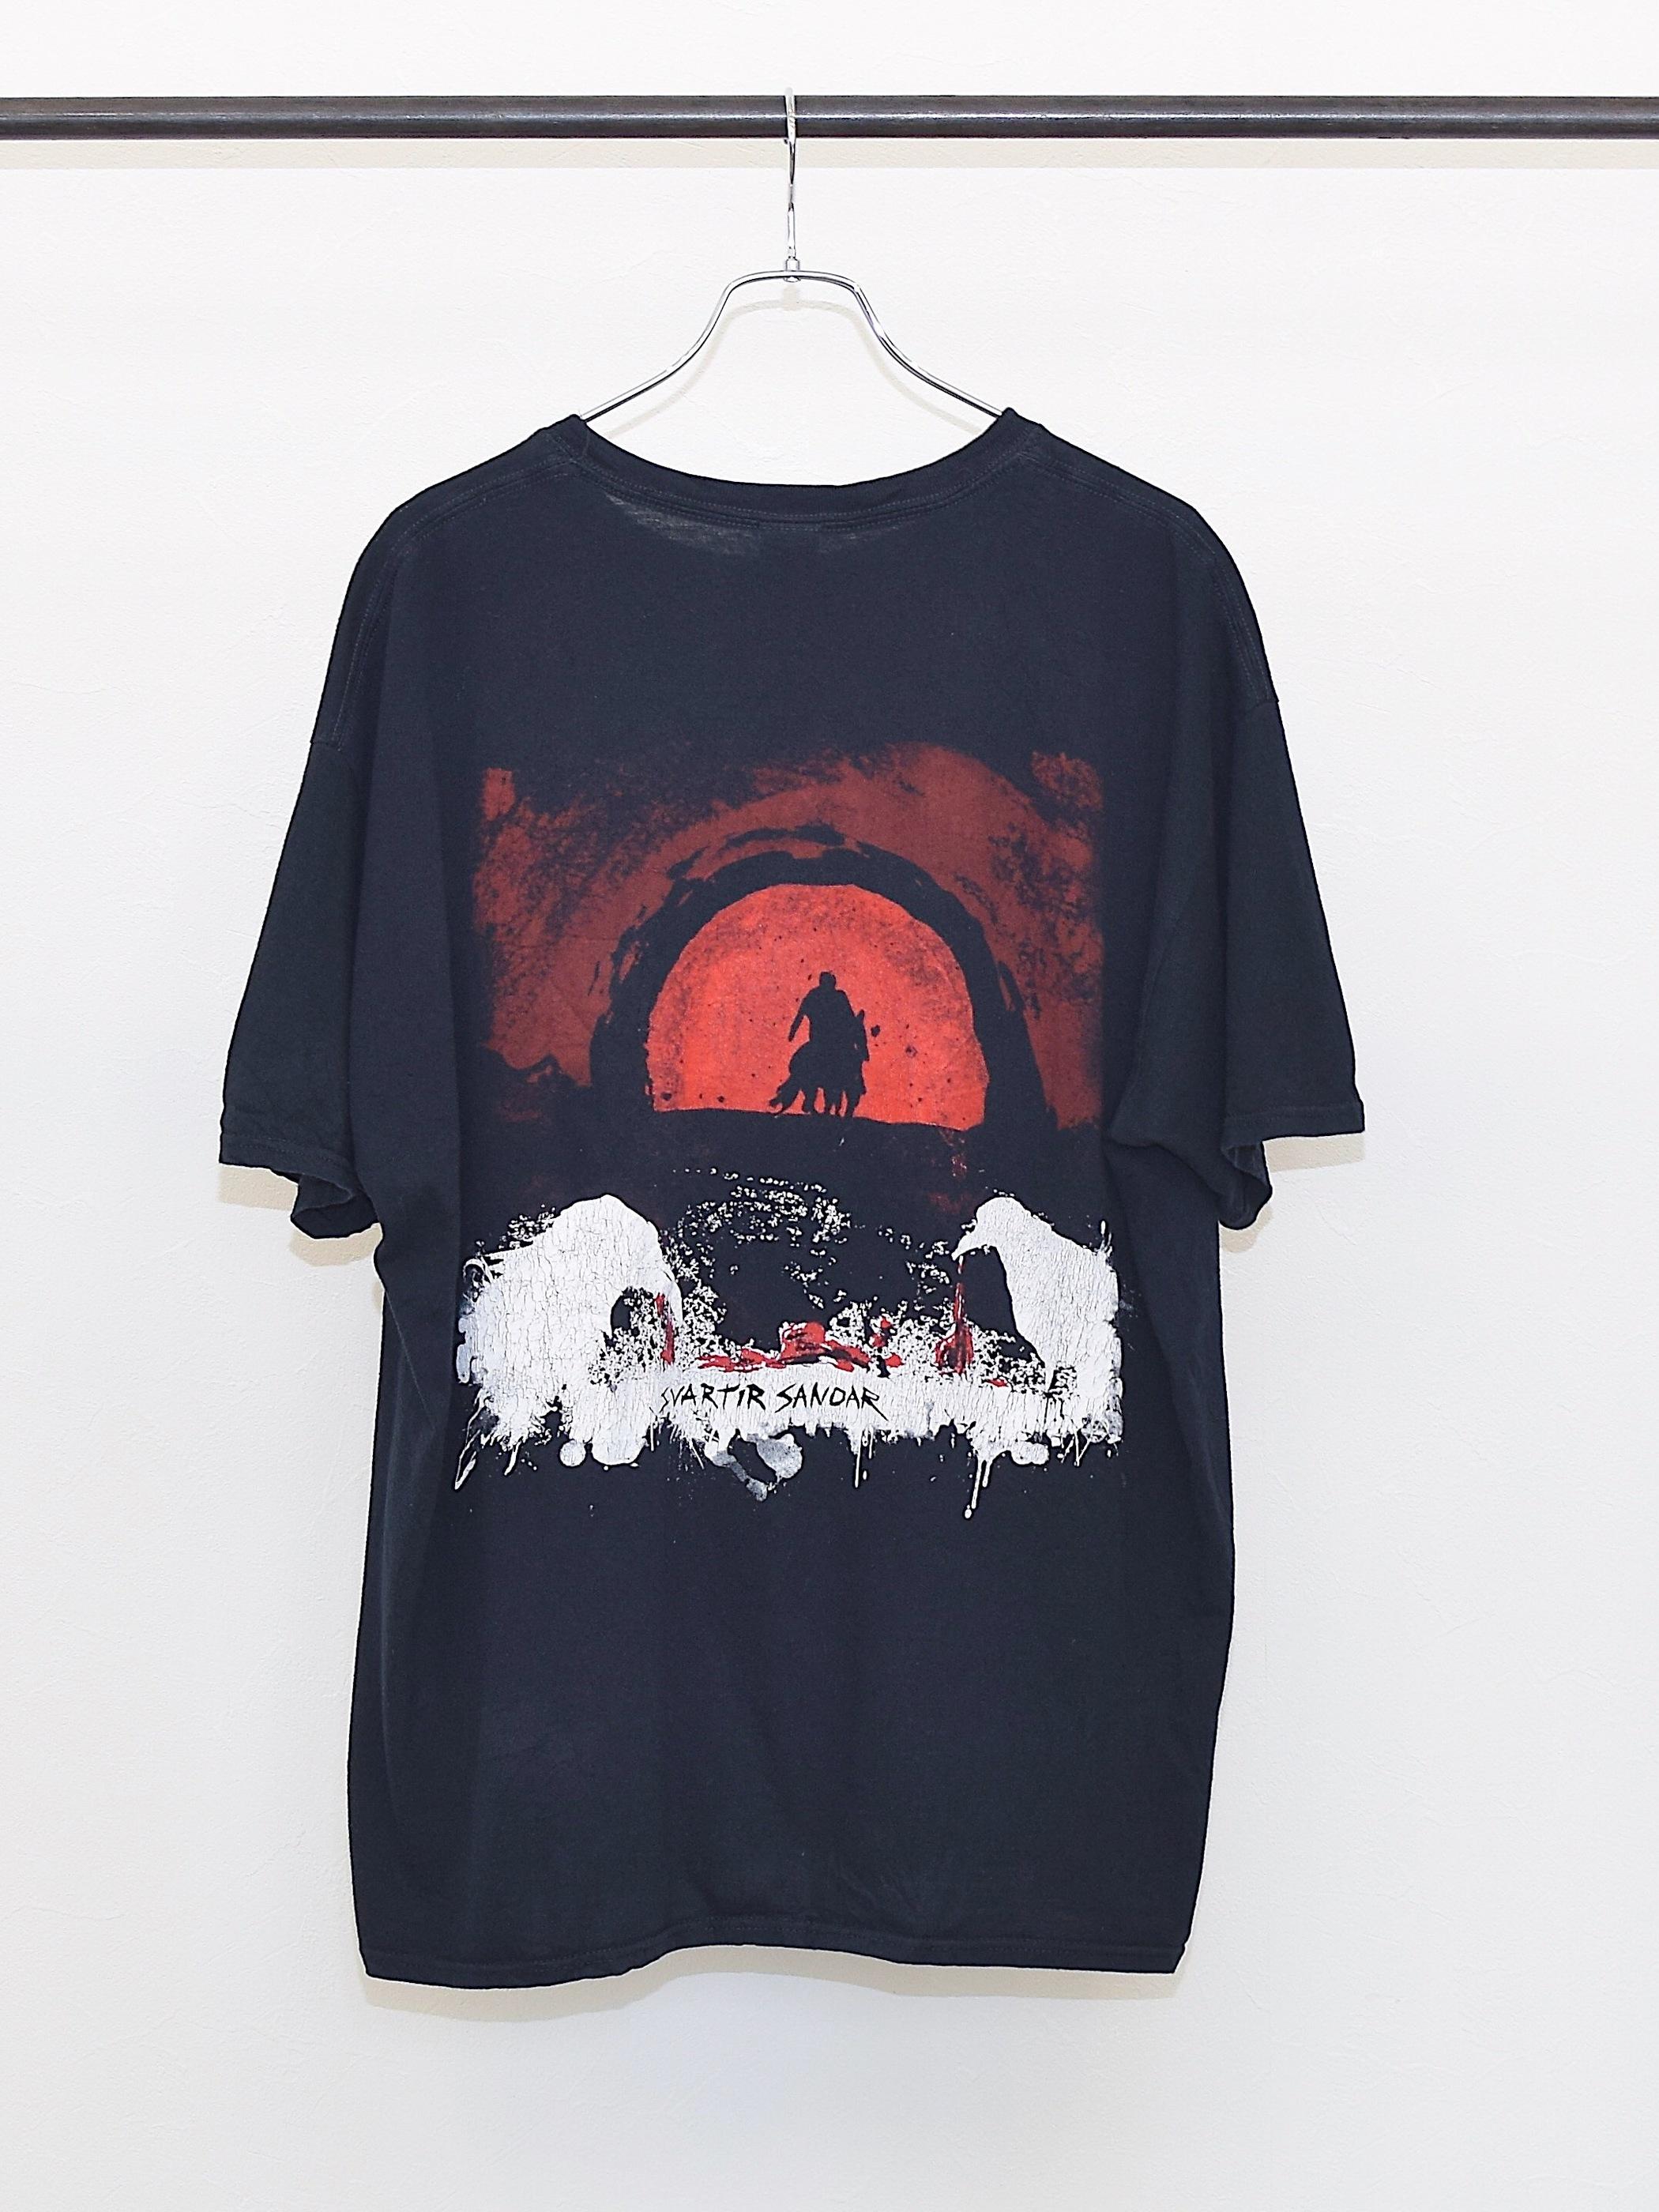 Vintage solstafir T-shirt